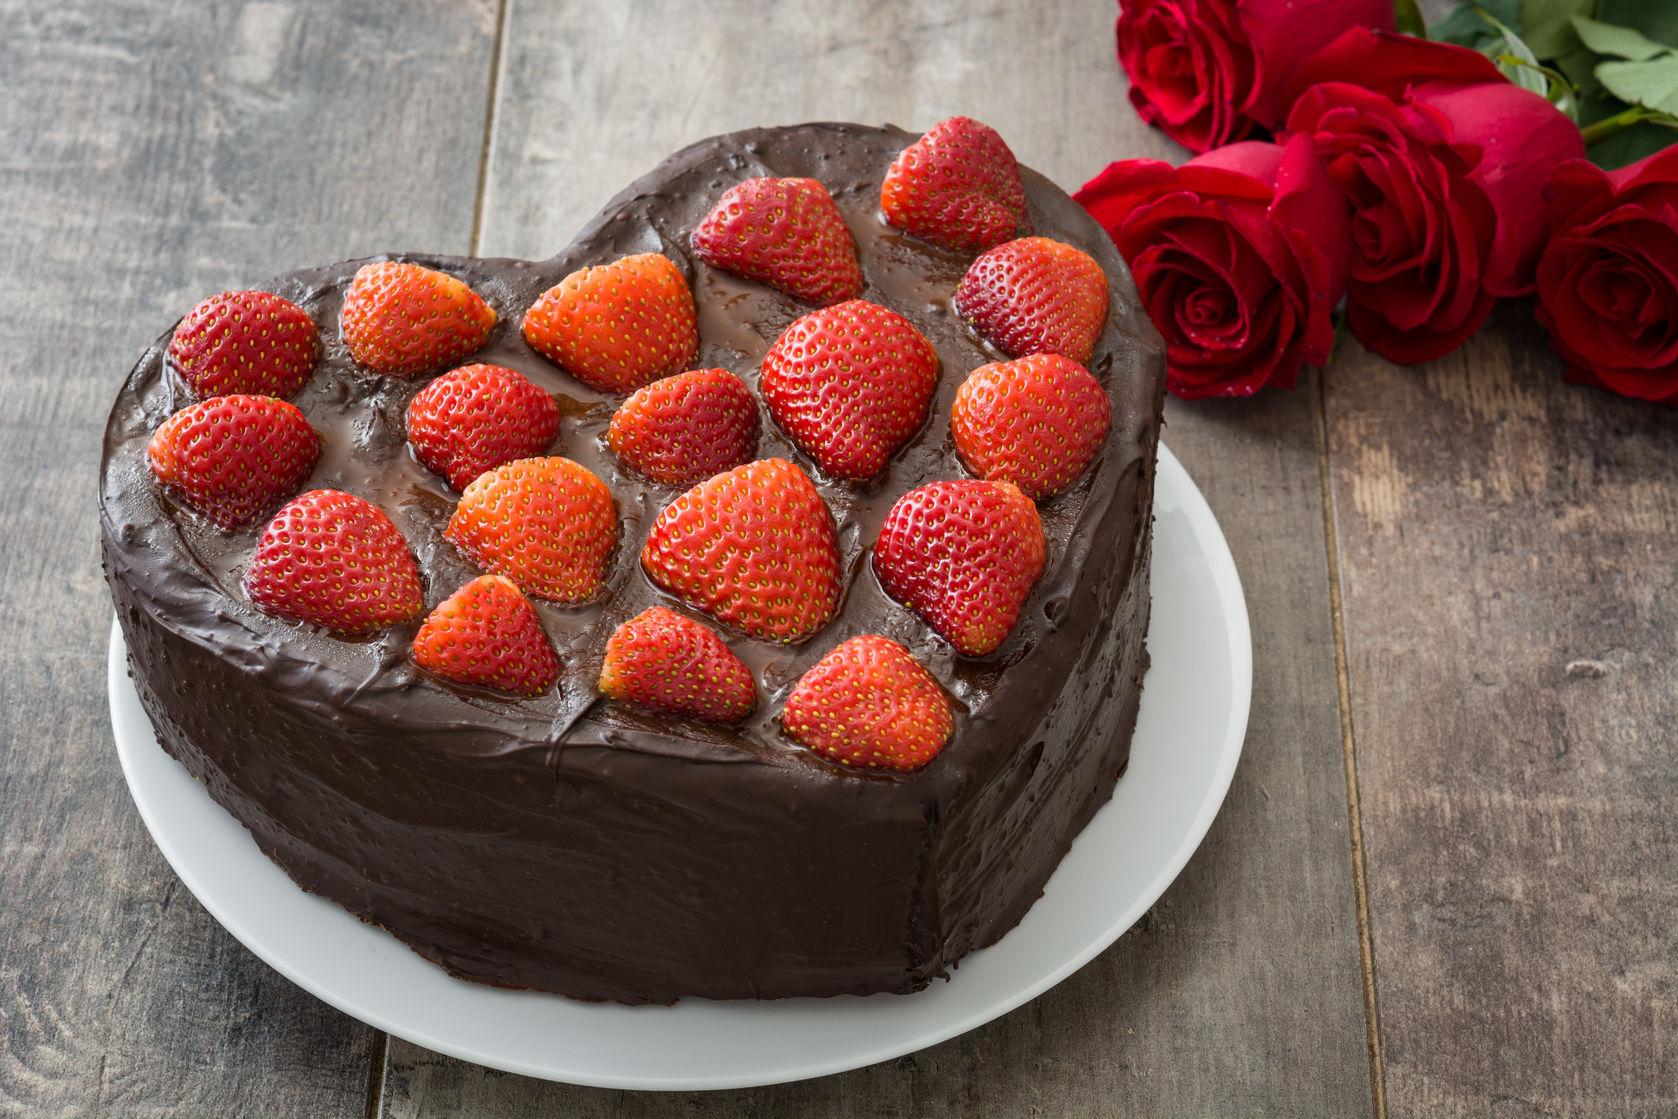 csokitorta valentin napra